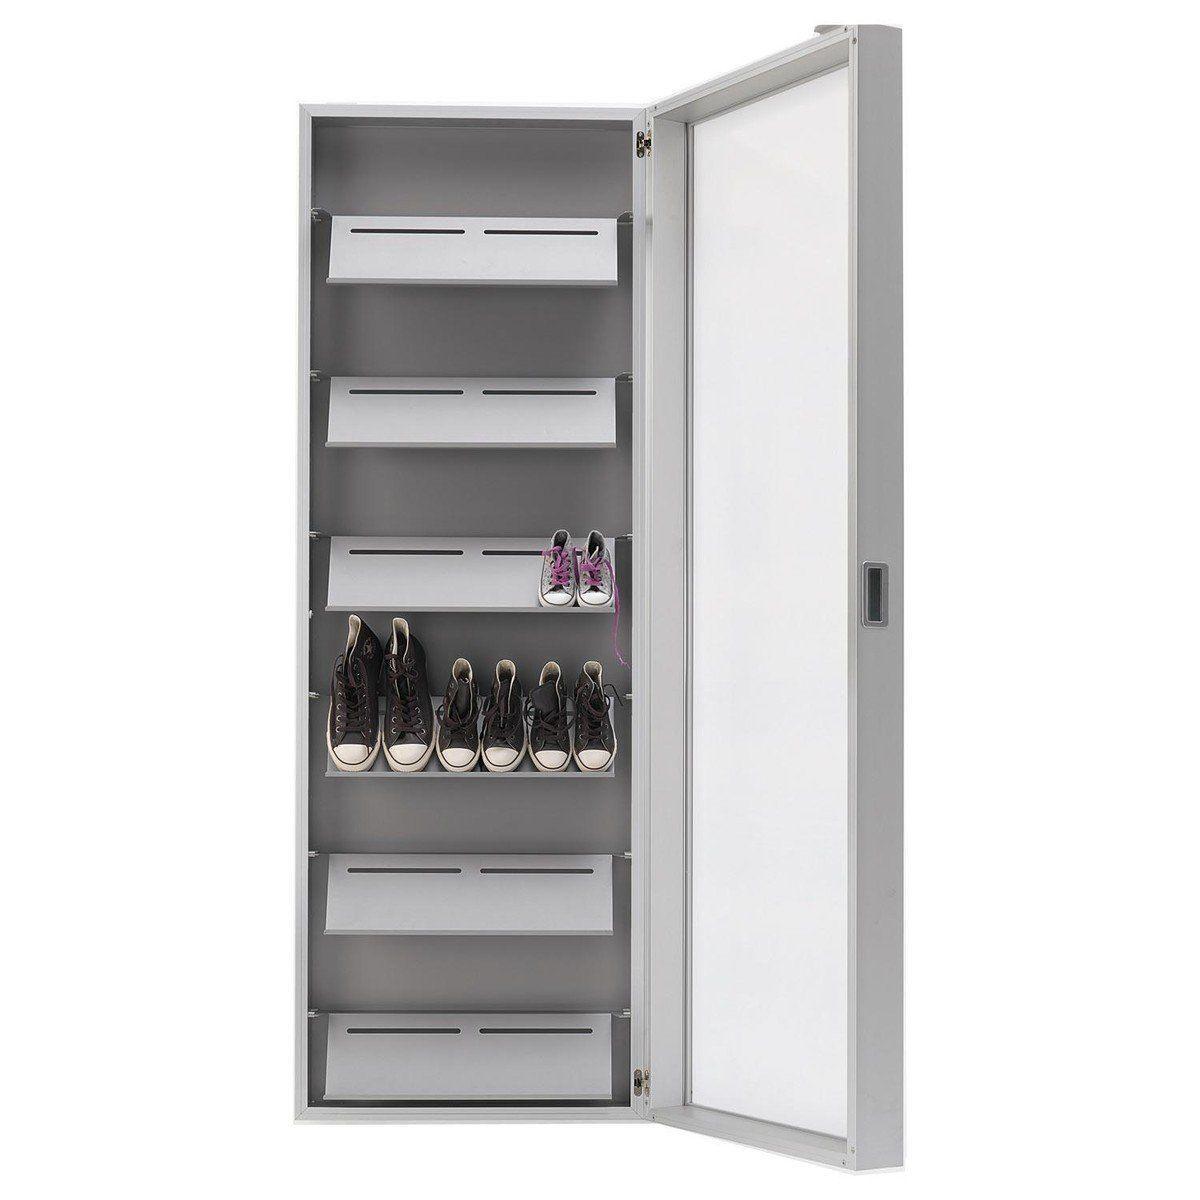 Delicieux Kristalia   Foot Box Shoe Cabinet   Aluminium/mirror/190x65x20cm/6 ...